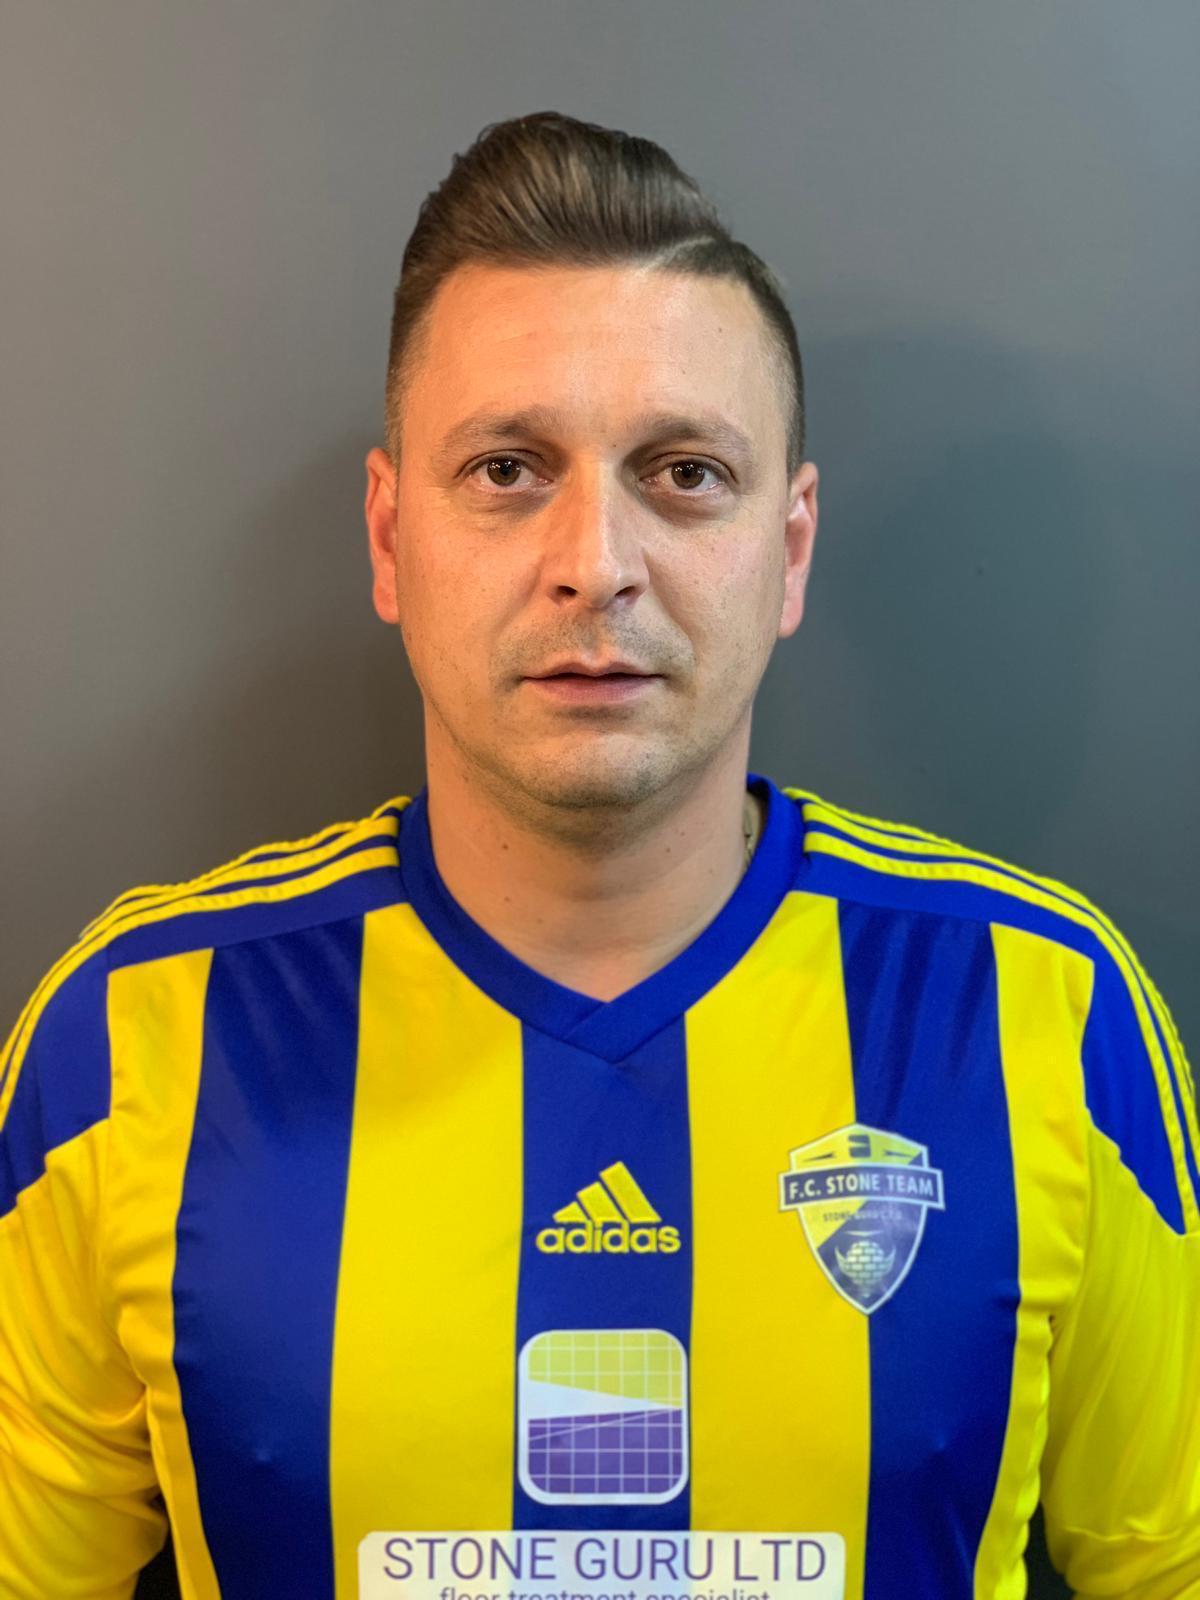 Georza Vladut Bogdan Ioan